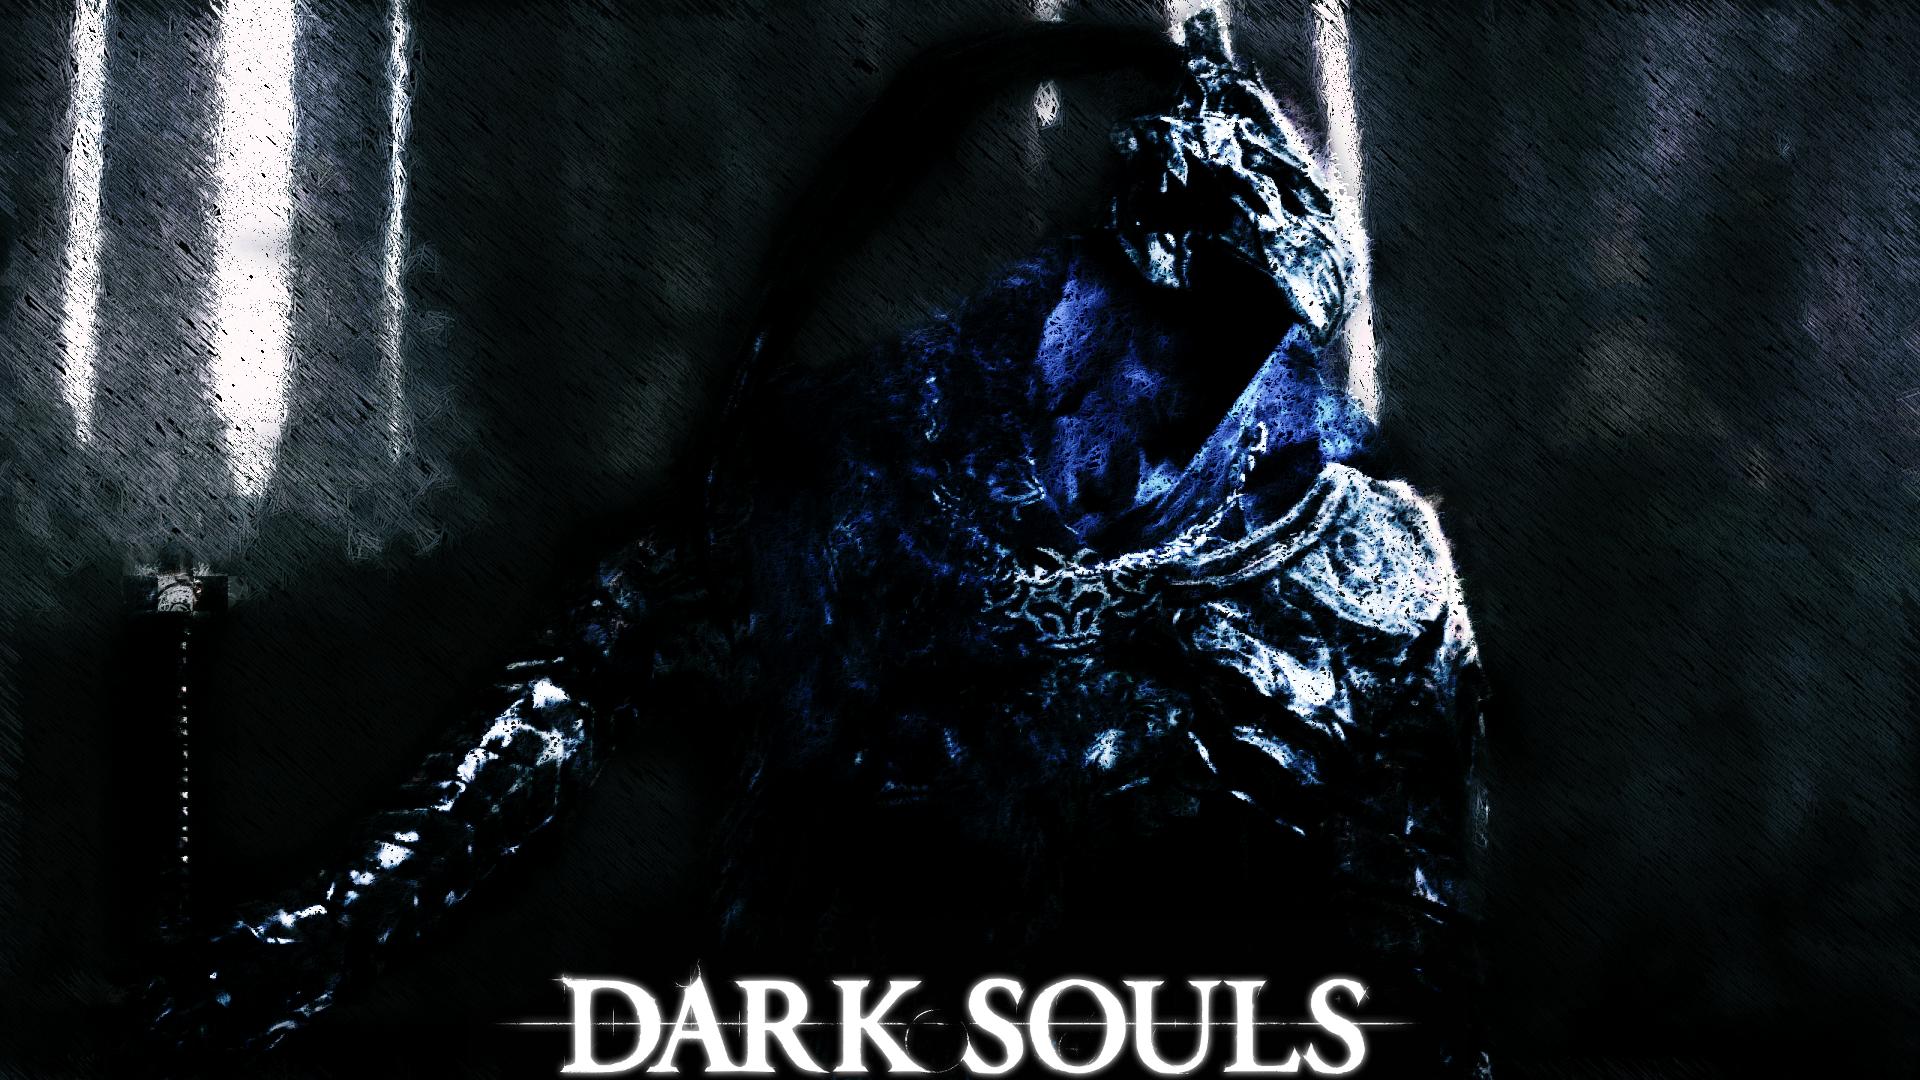 Free Download Dark Souls Artorias Wallpaper By Dragunowx